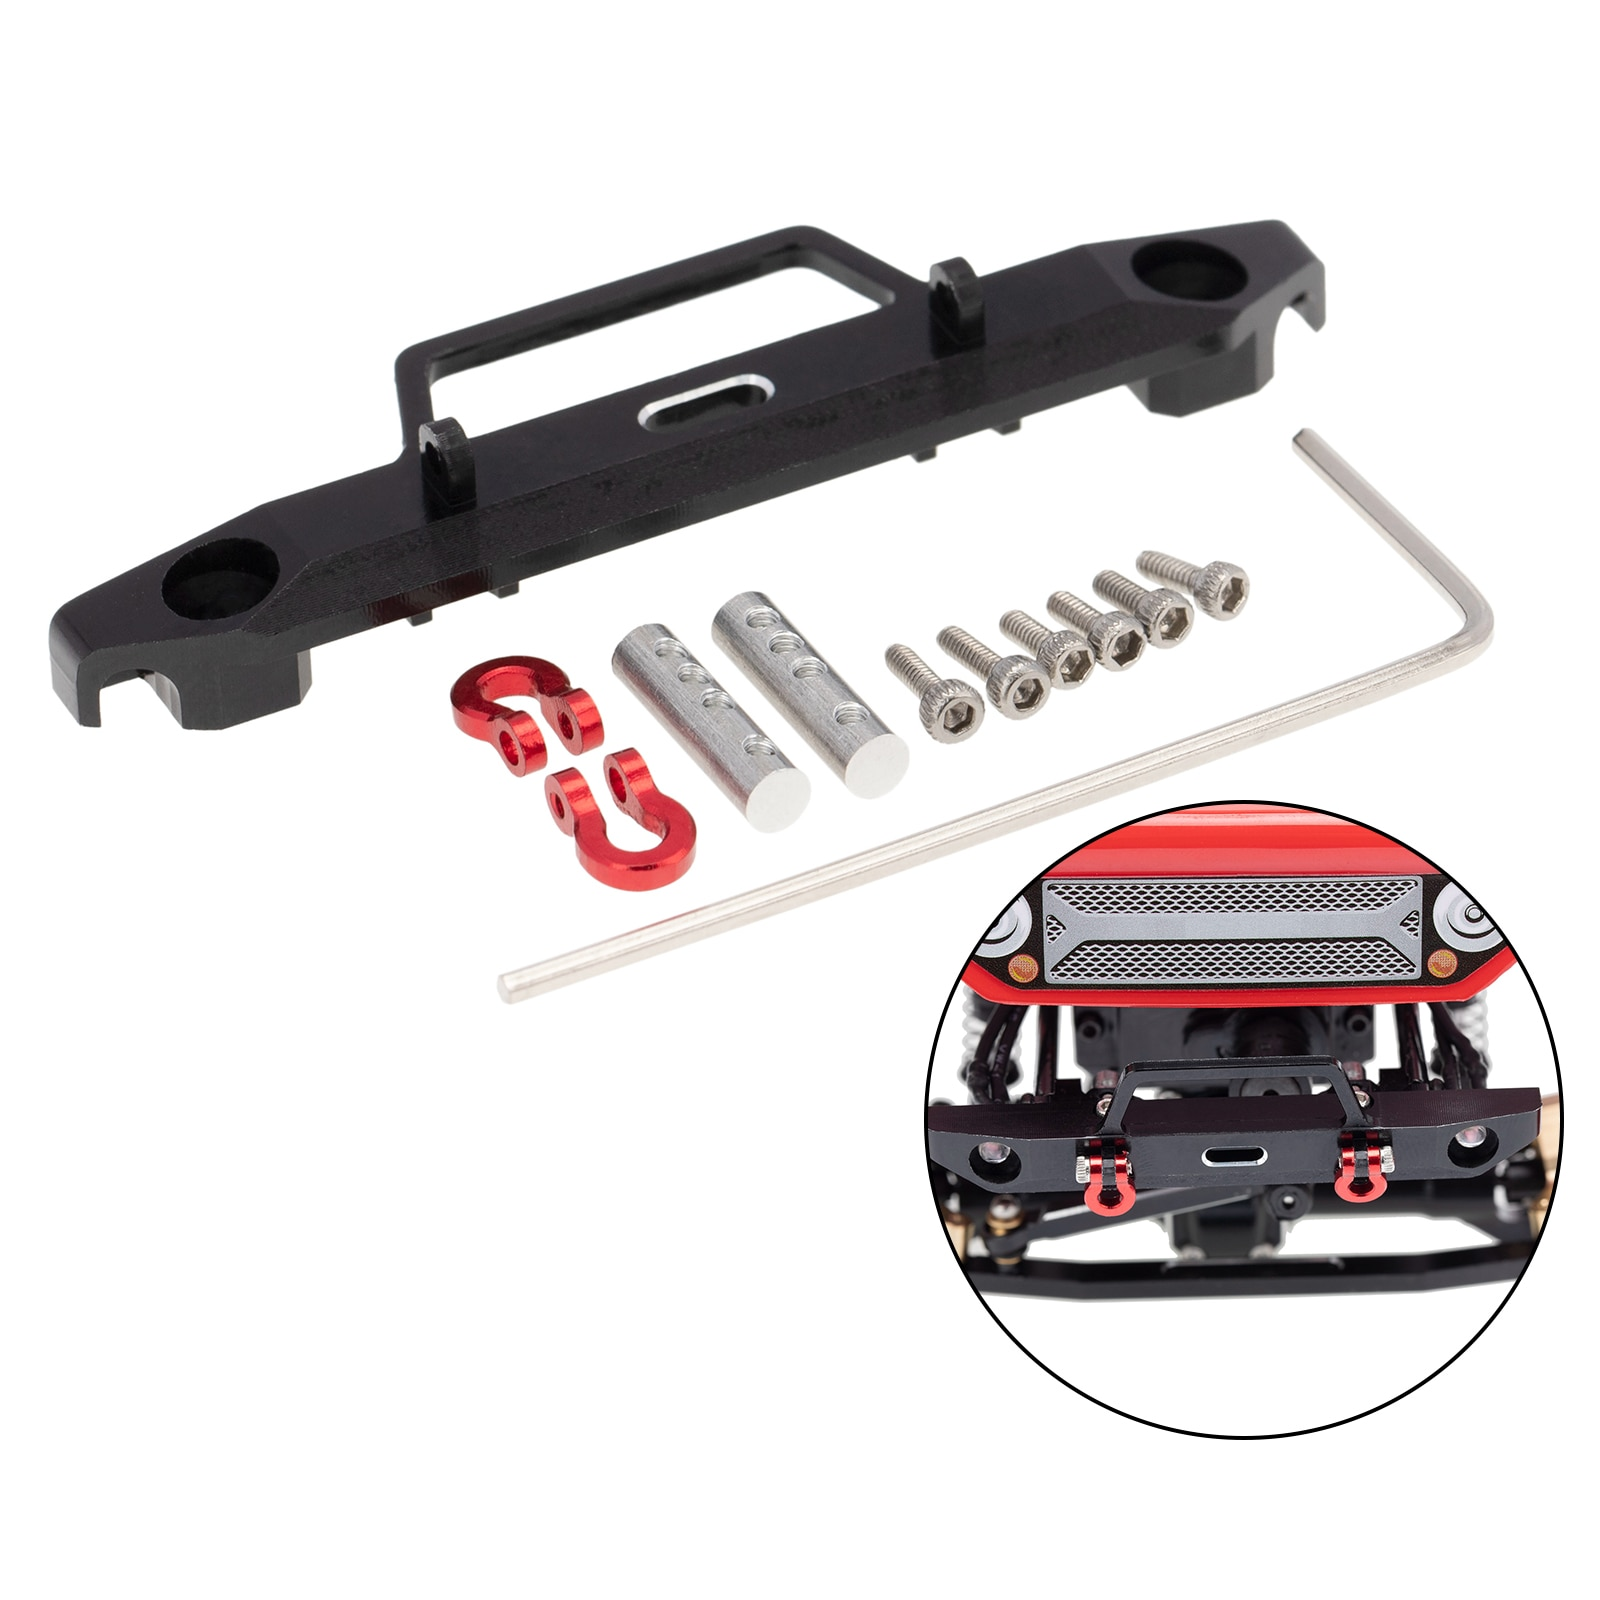 Remote Control Car Parts Front Bumper for Axial SCX24 AX90081 DEADBOLT 1:24 Scale RC Crawler enlarge